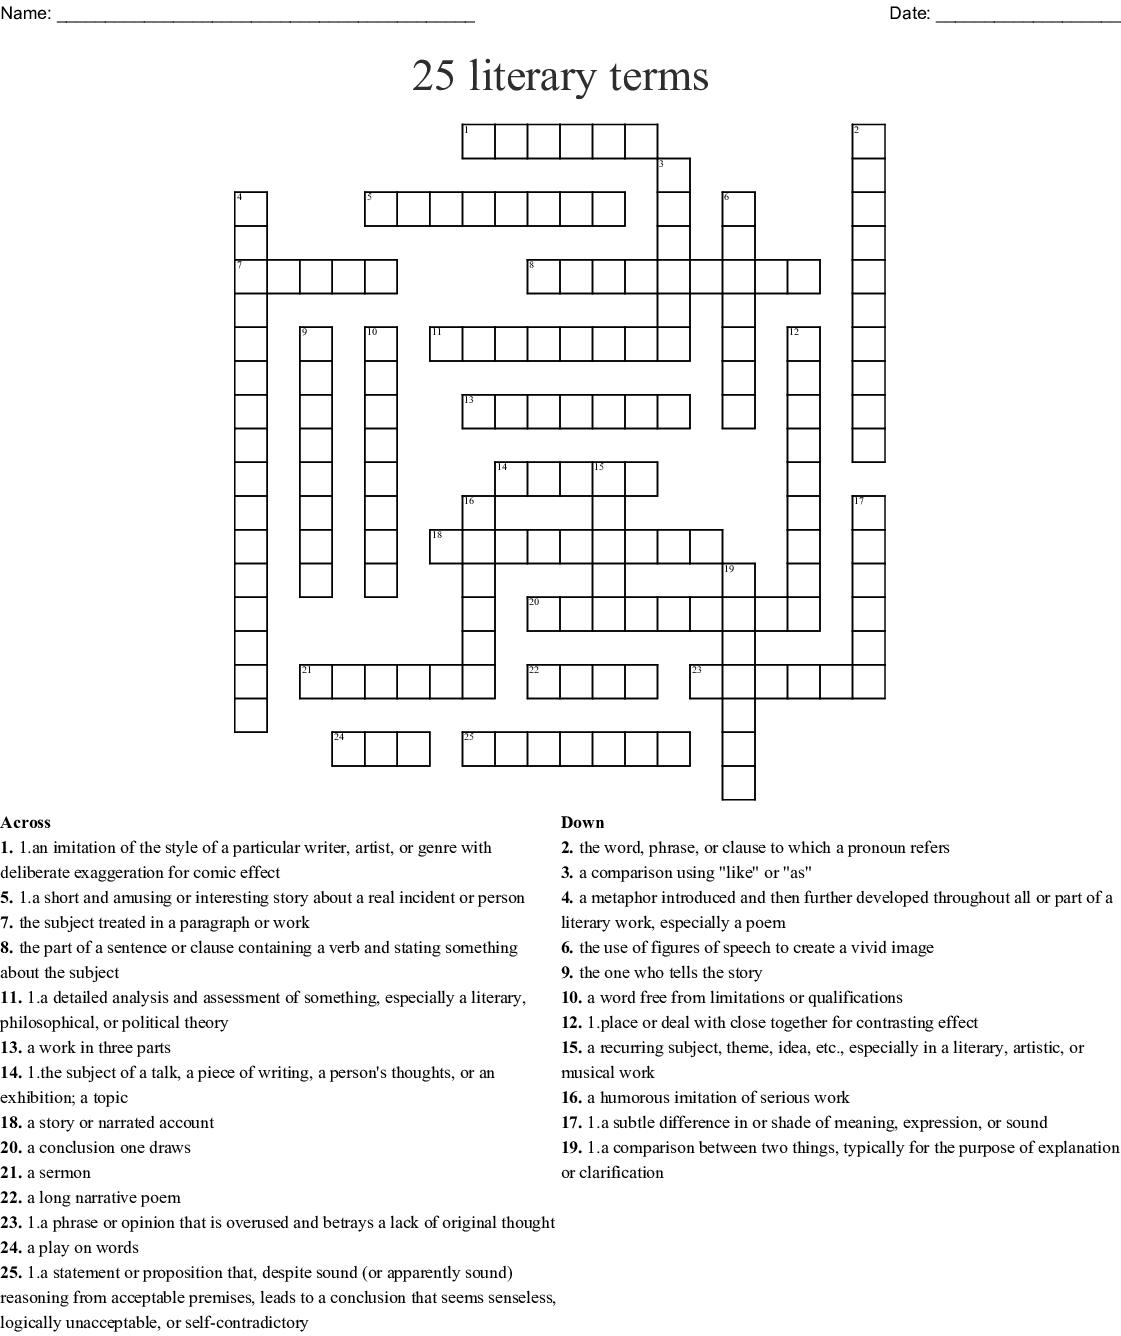 25 Literary Terms Crossword